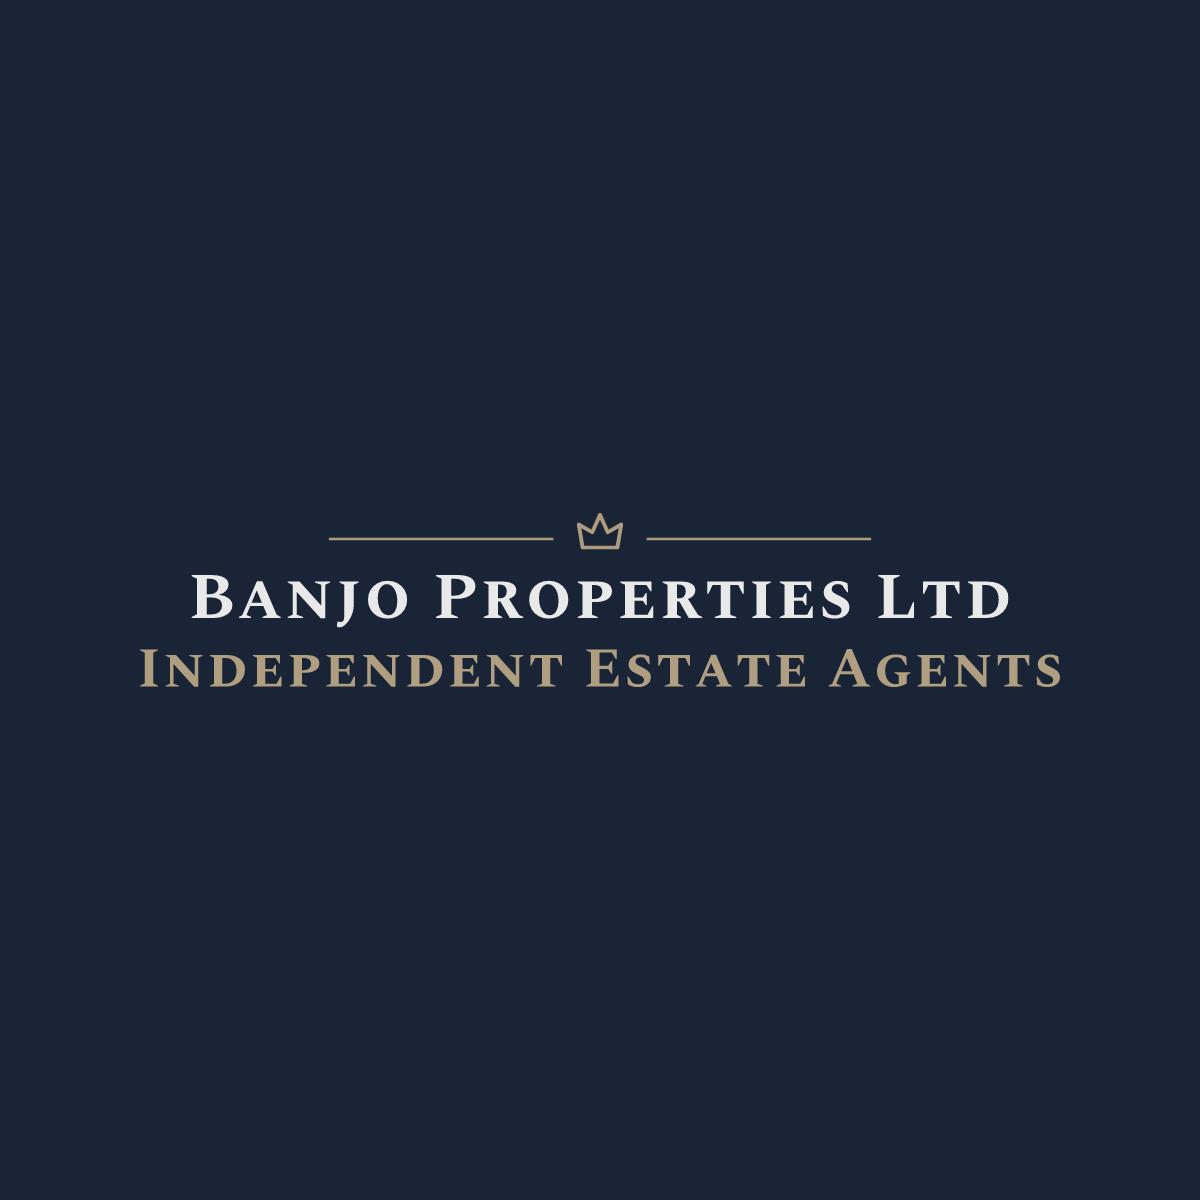 Banjo Properties Ltd Logo